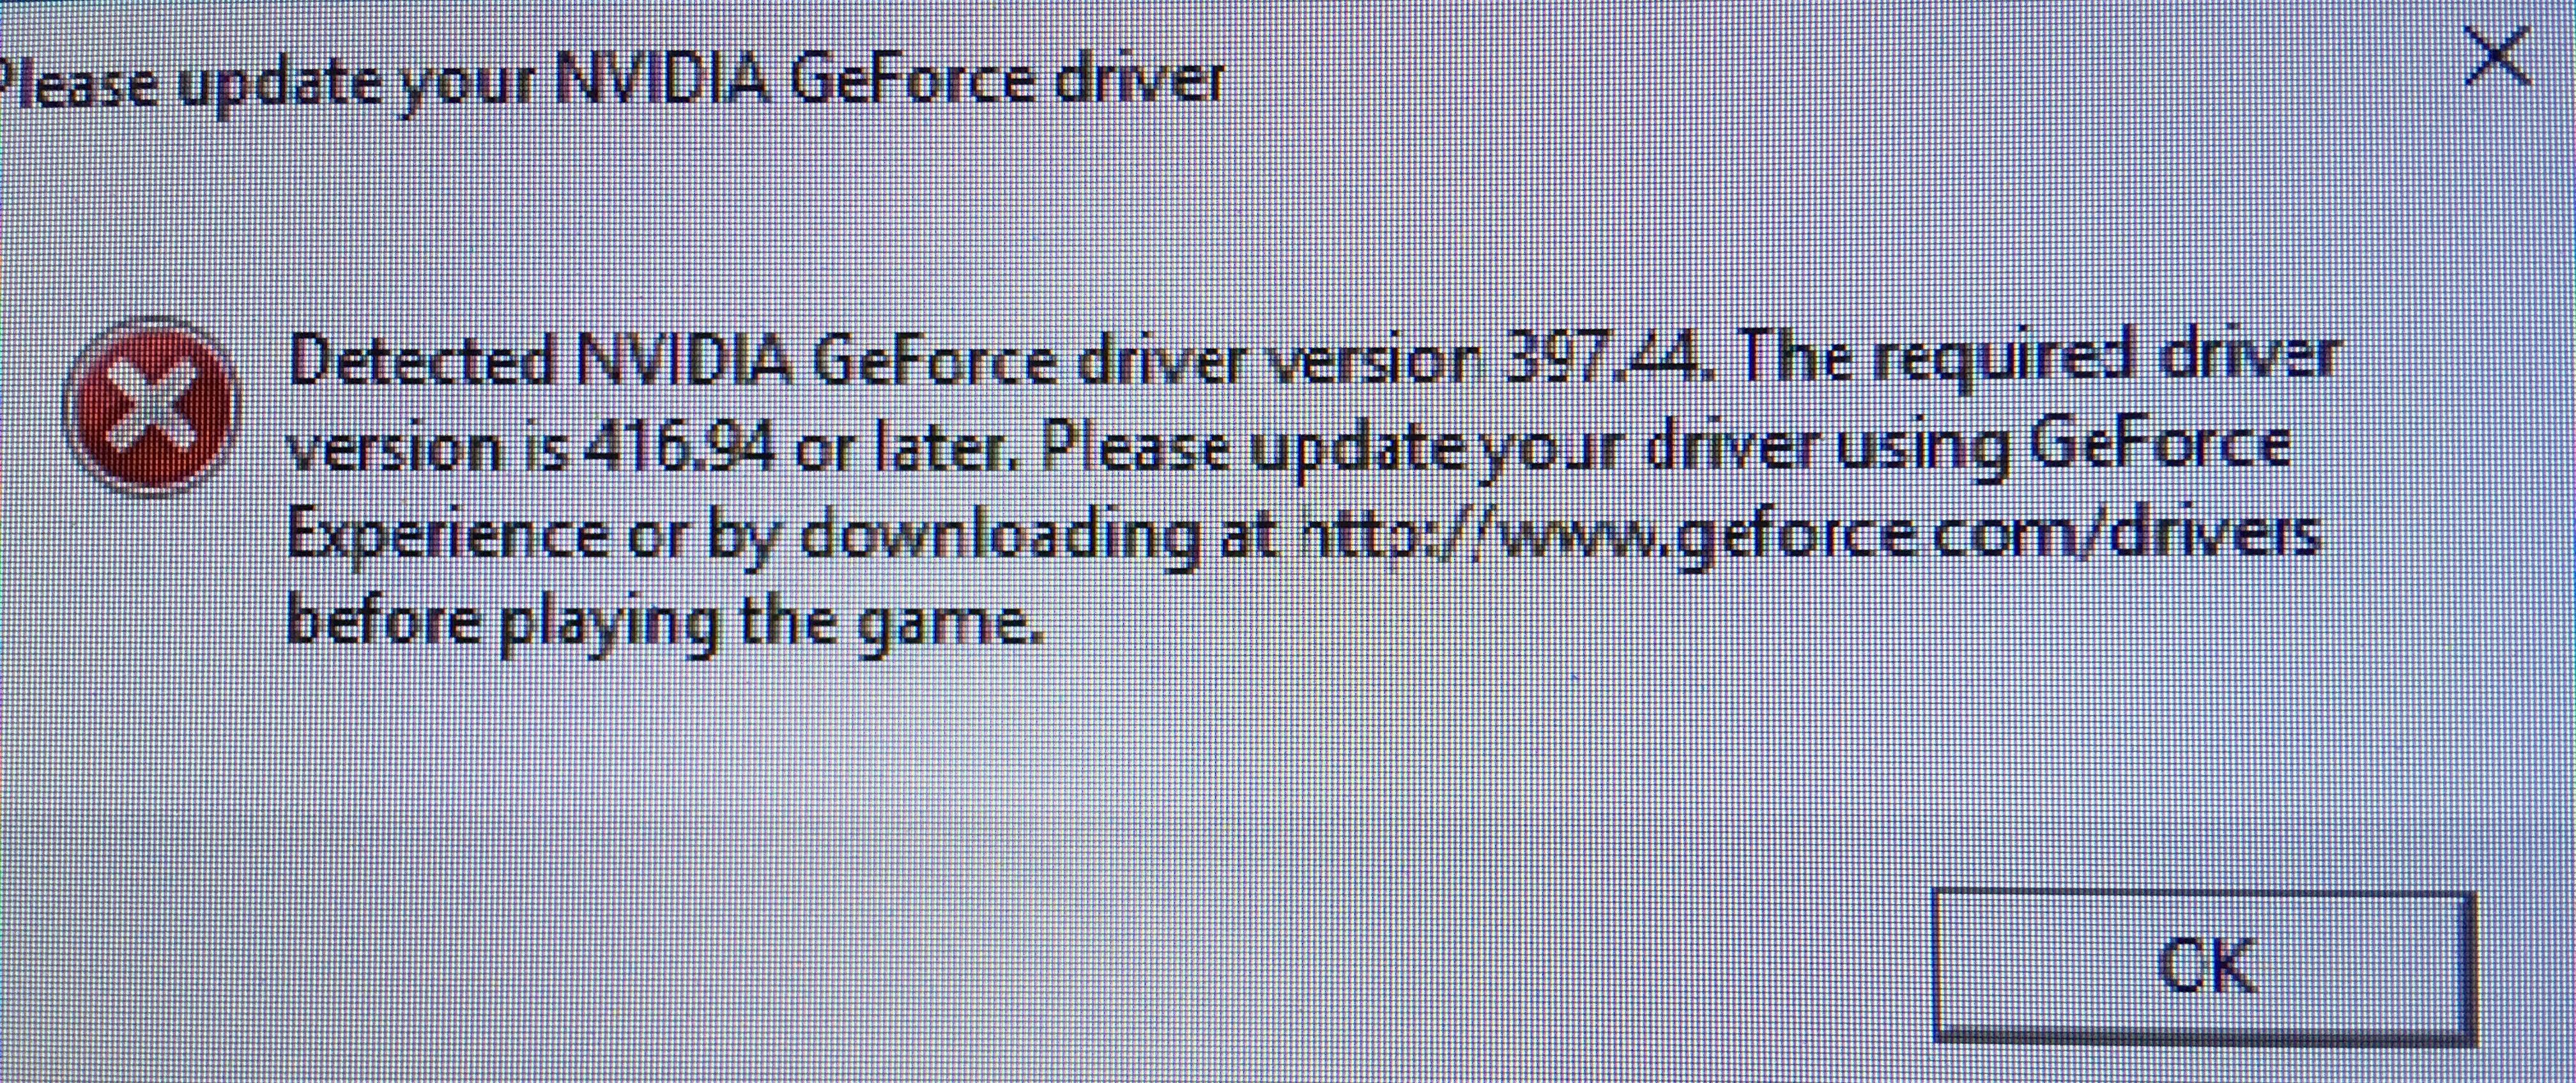 battlefield 1 nvidia driver version